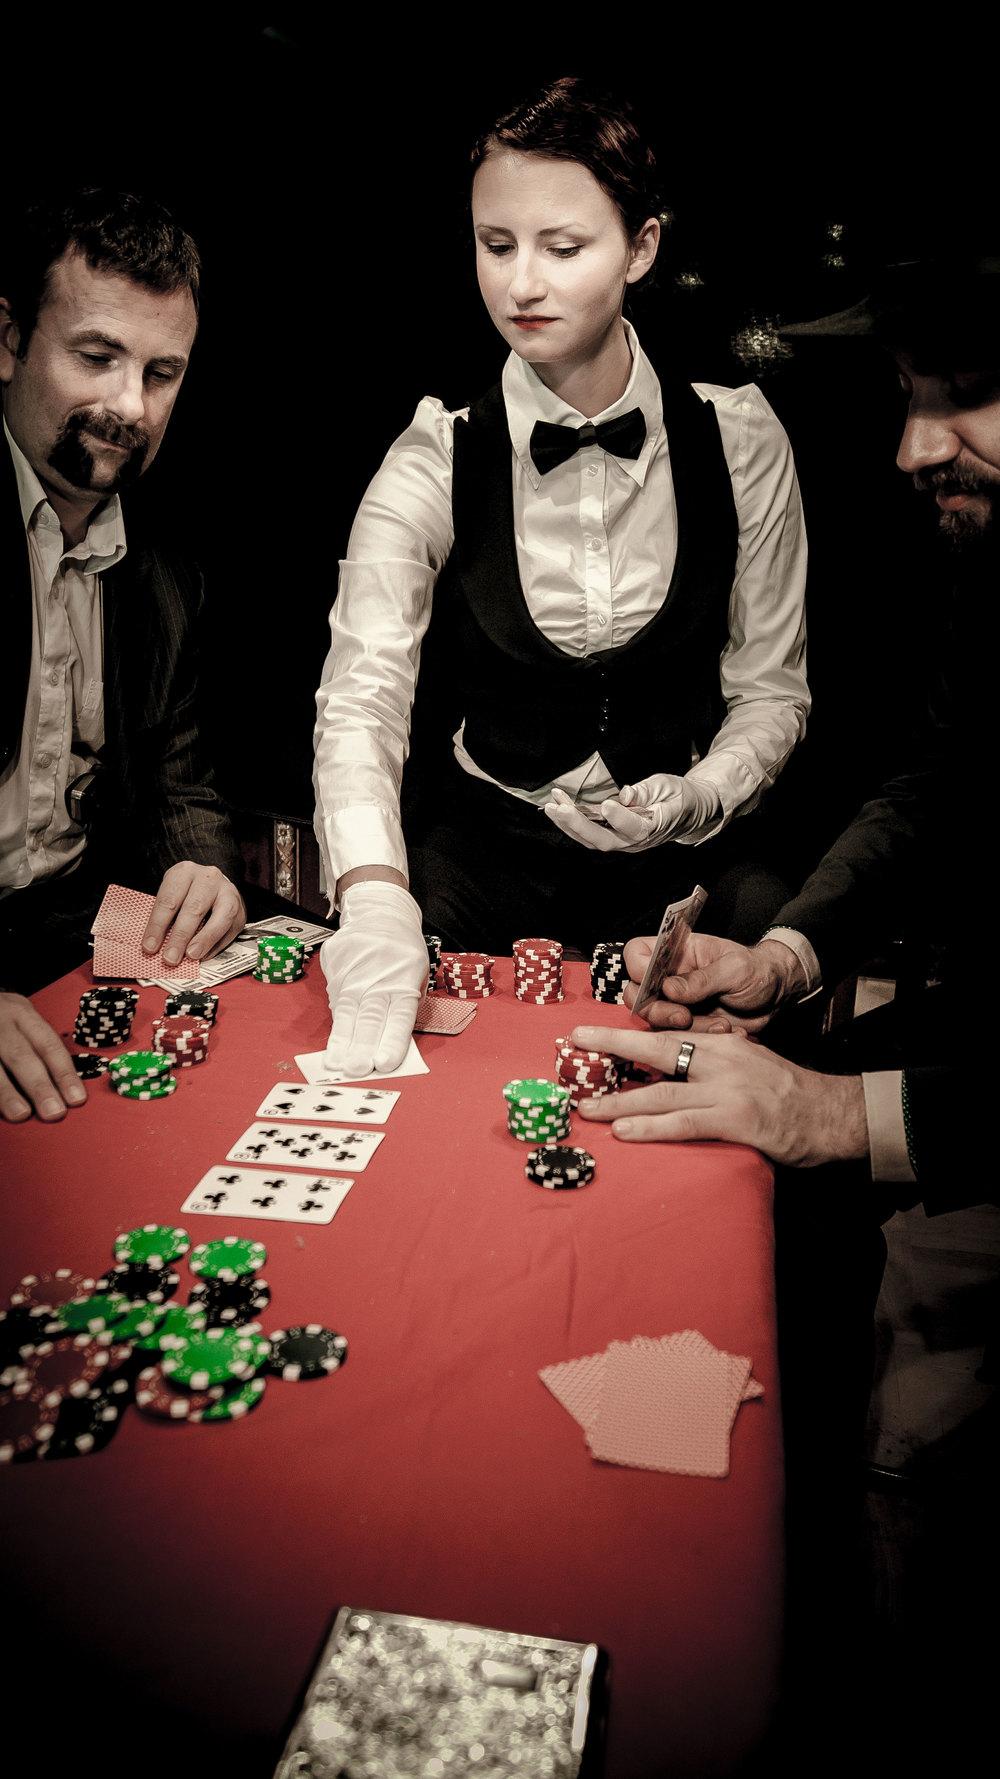 Famiglia Bonifacio: Casino Fortuna Foto:  Tomislav Jeffrey Jemrić